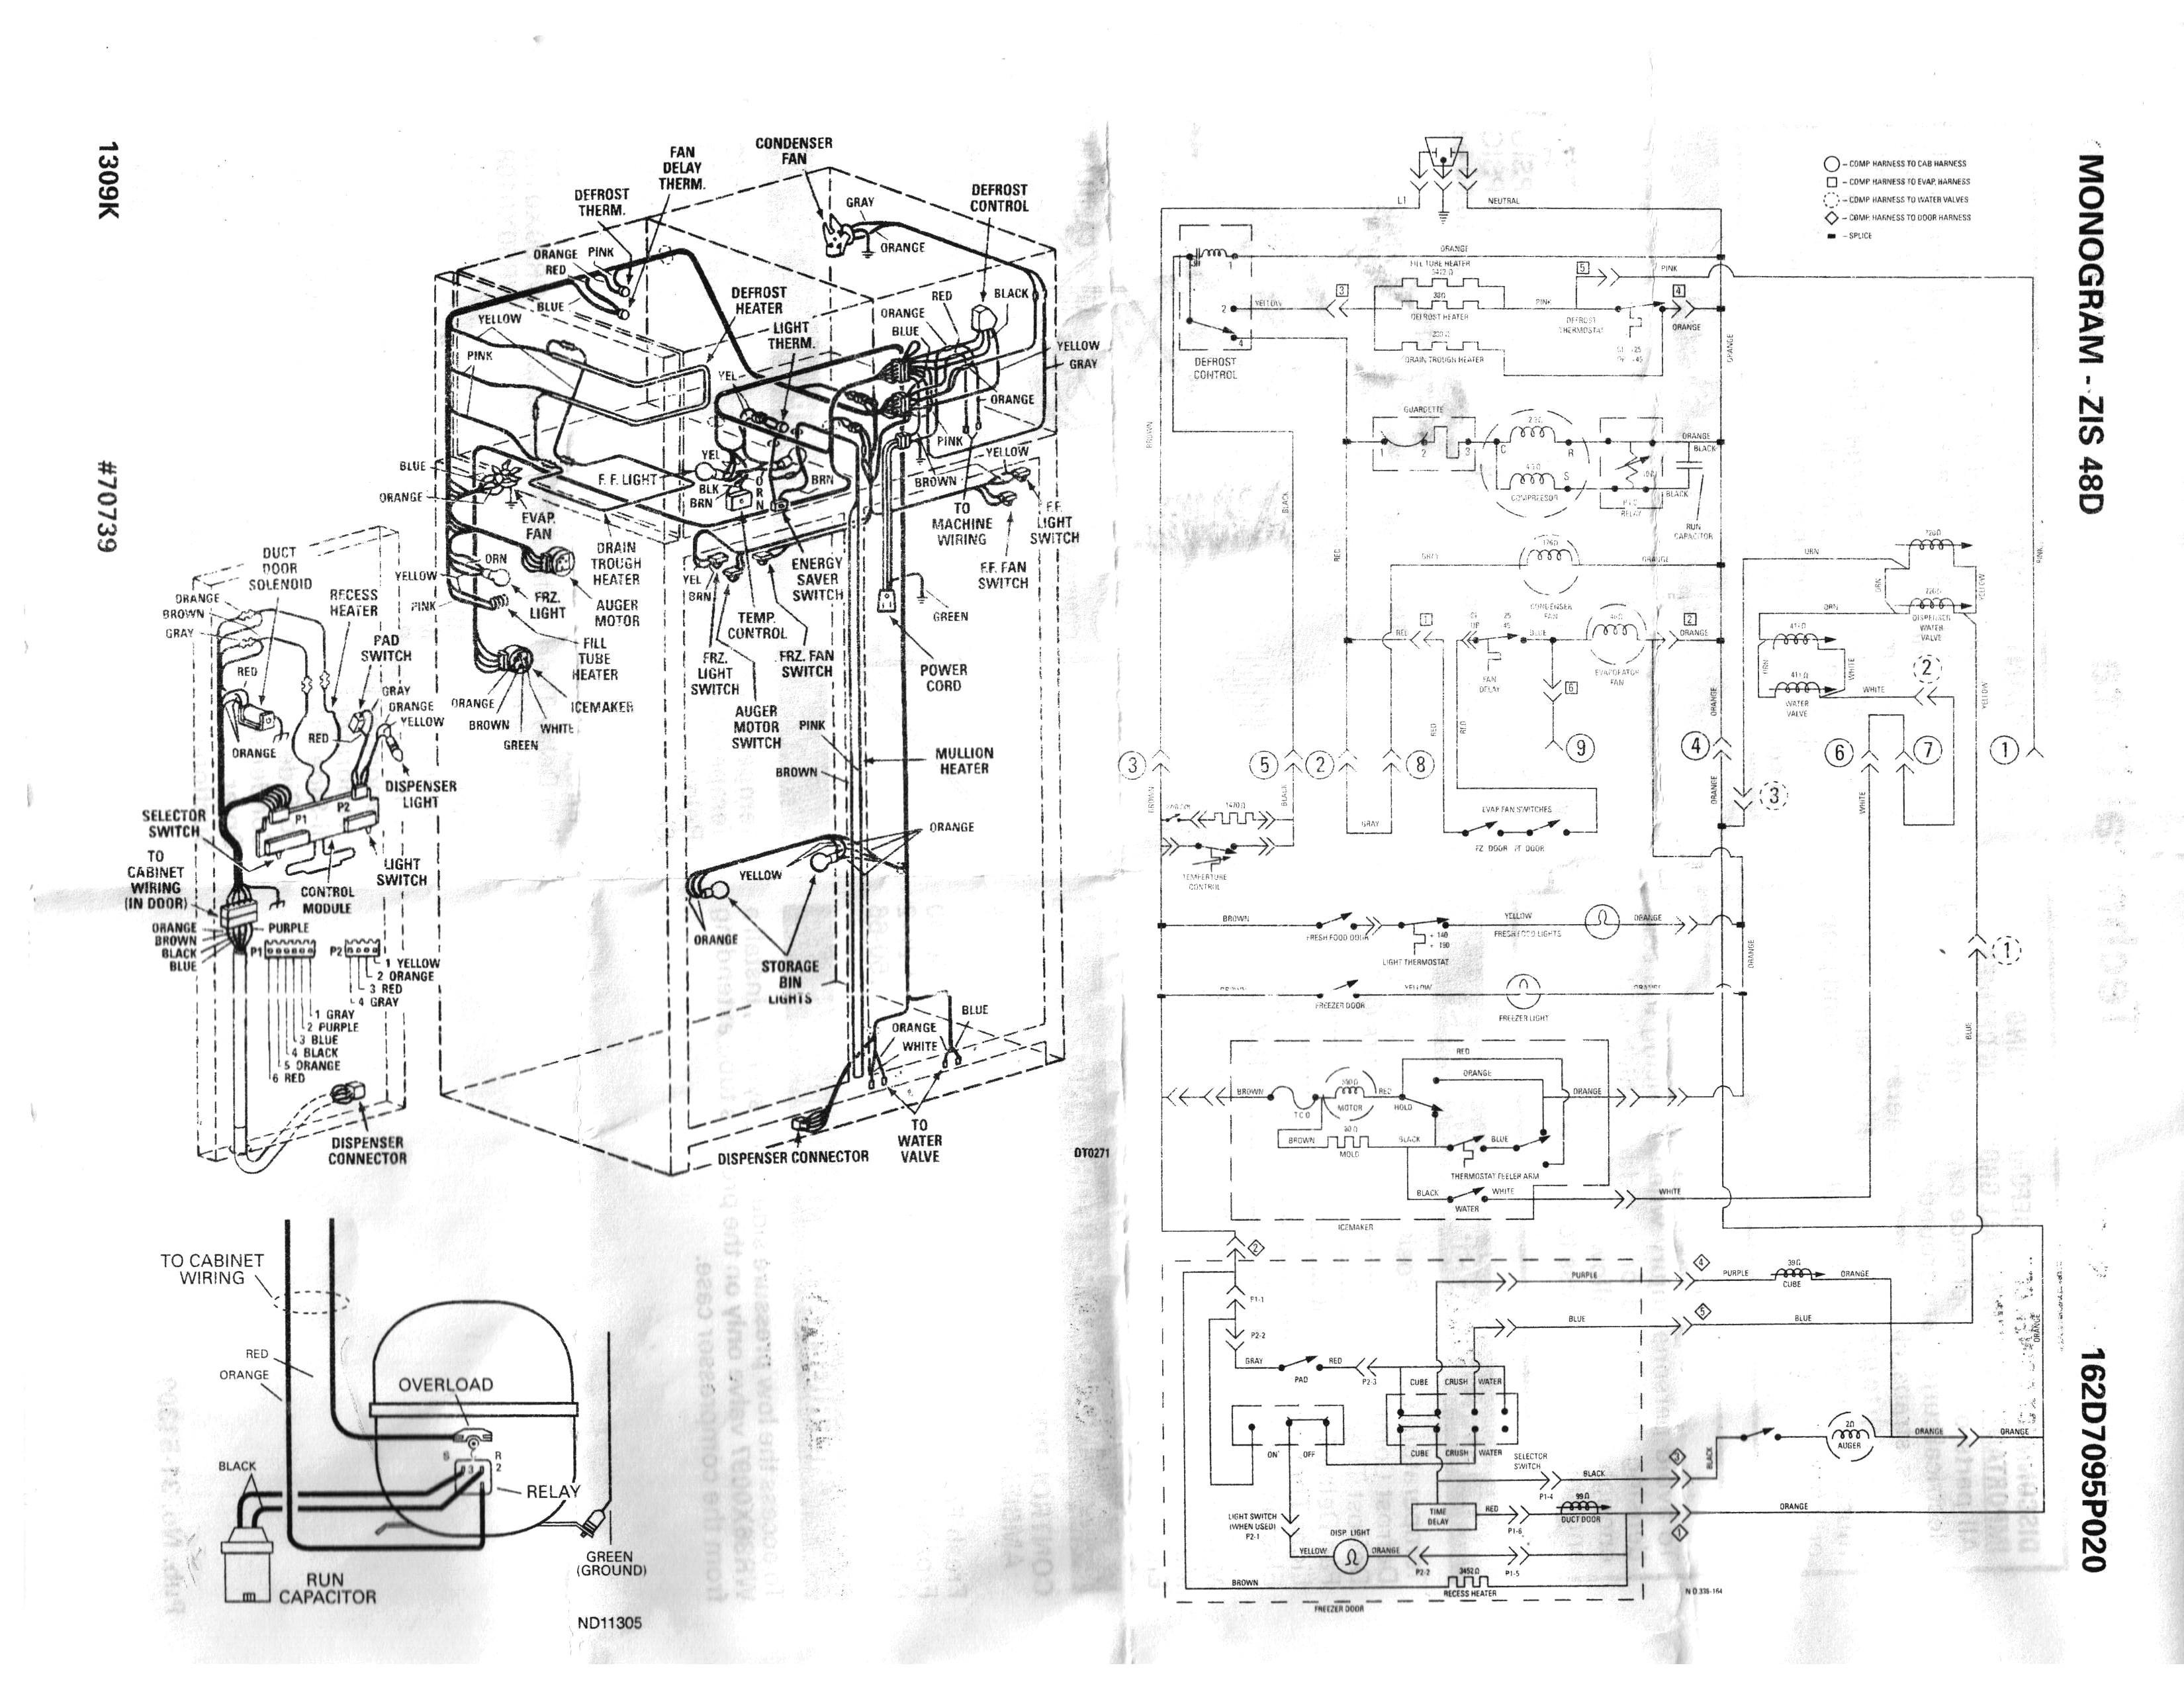 DIAGRAM] Vintage Ge Refrigerator Wiring Diagram FULL Version HD Quality Wiring  Diagram - RADIODIAGRAM.AMMINISTRAZIONEINCAMMINO.ITDiagram Database - amministrazioneincammino.it